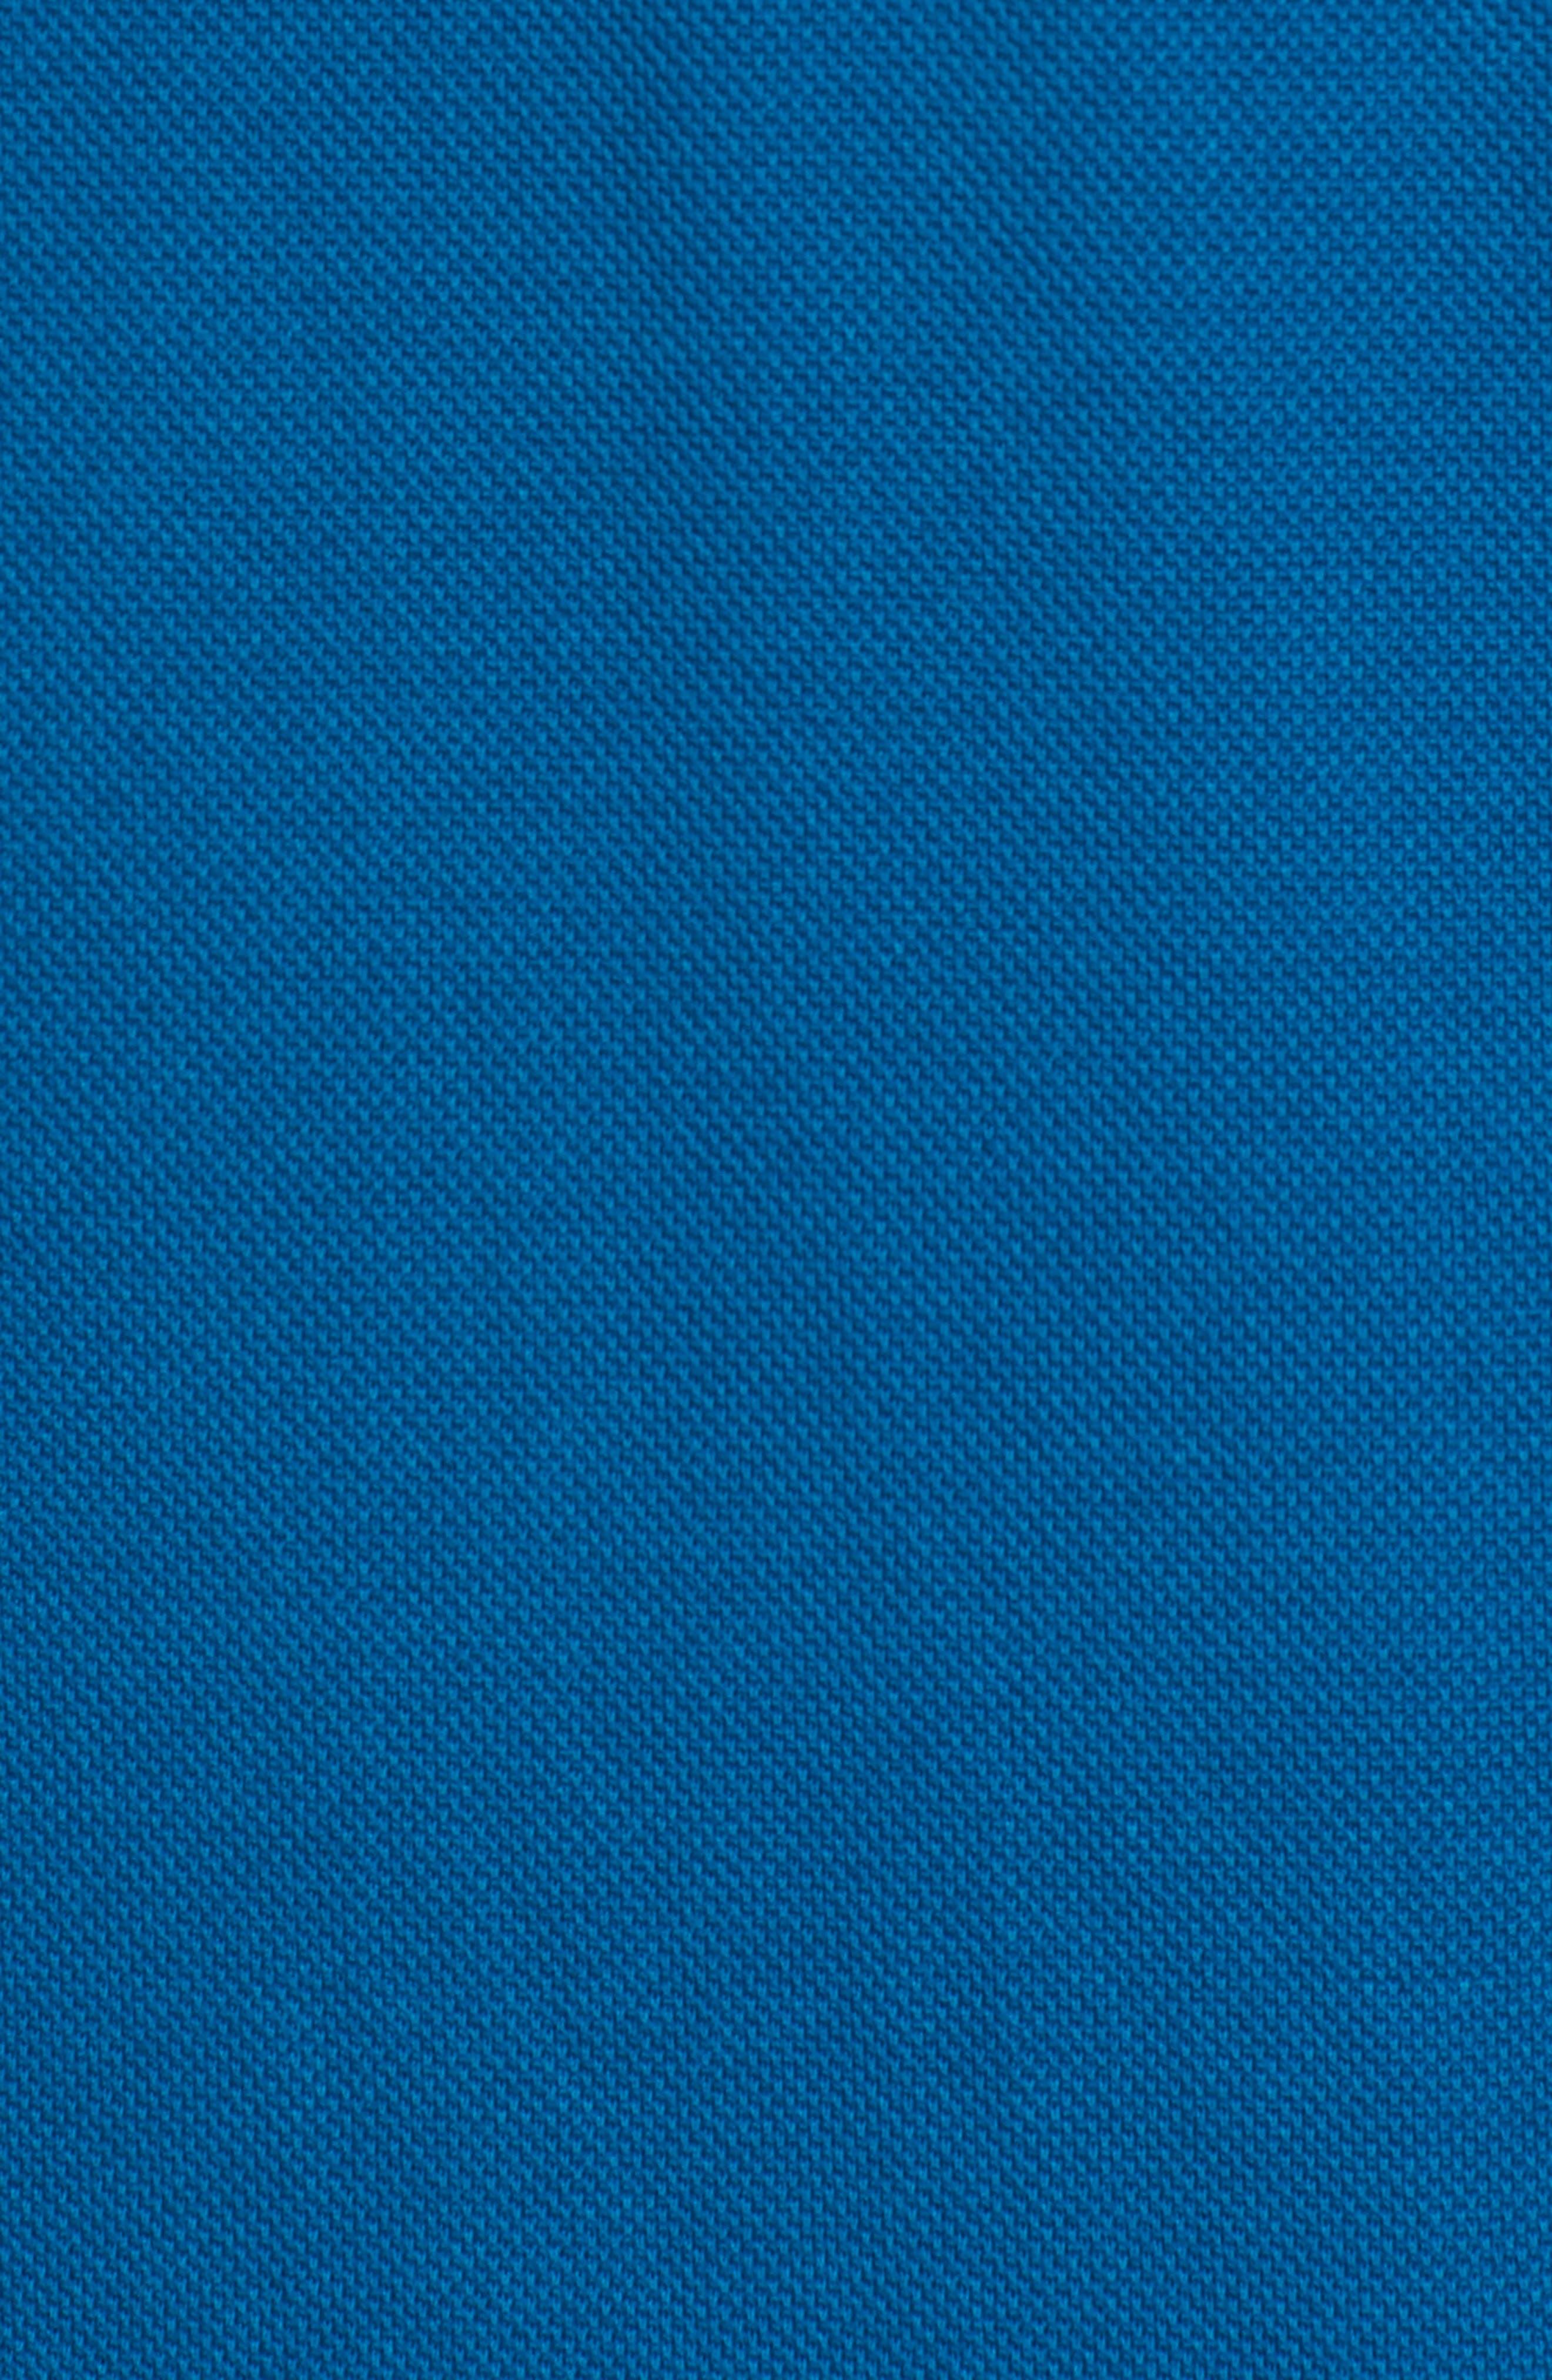 Regular Fit Knit Sport Shirt,                             Alternate thumbnail 5, color,                             Teal